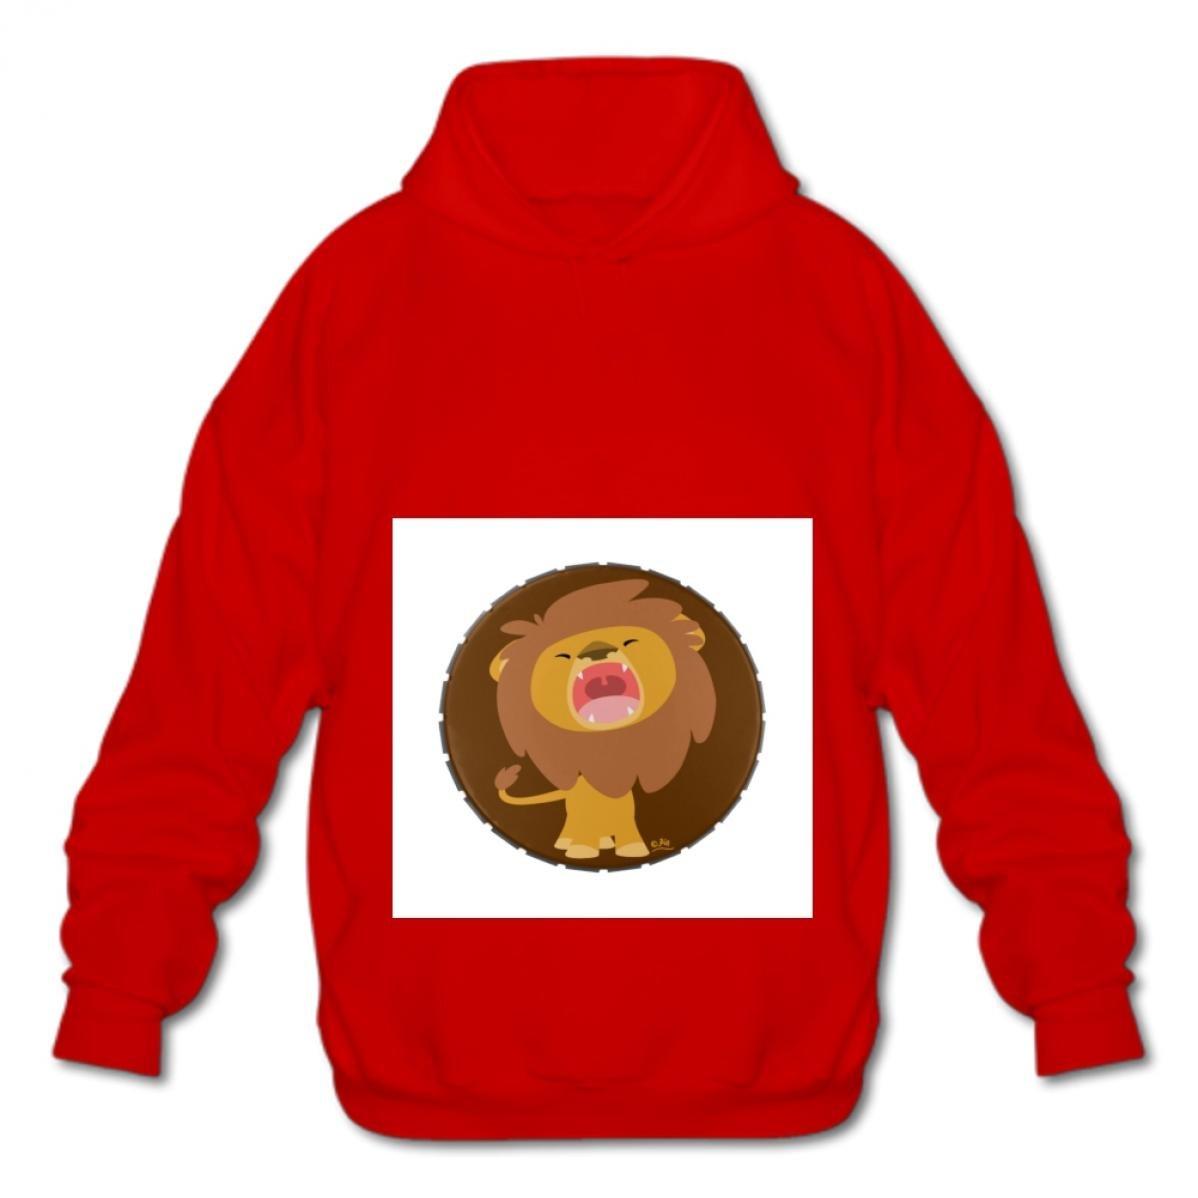 Euochengqus Sweatshirt Mens Fashion Fashion Hoodies-03 Cartoon Lion Uxni Cotton Pullover Hooded